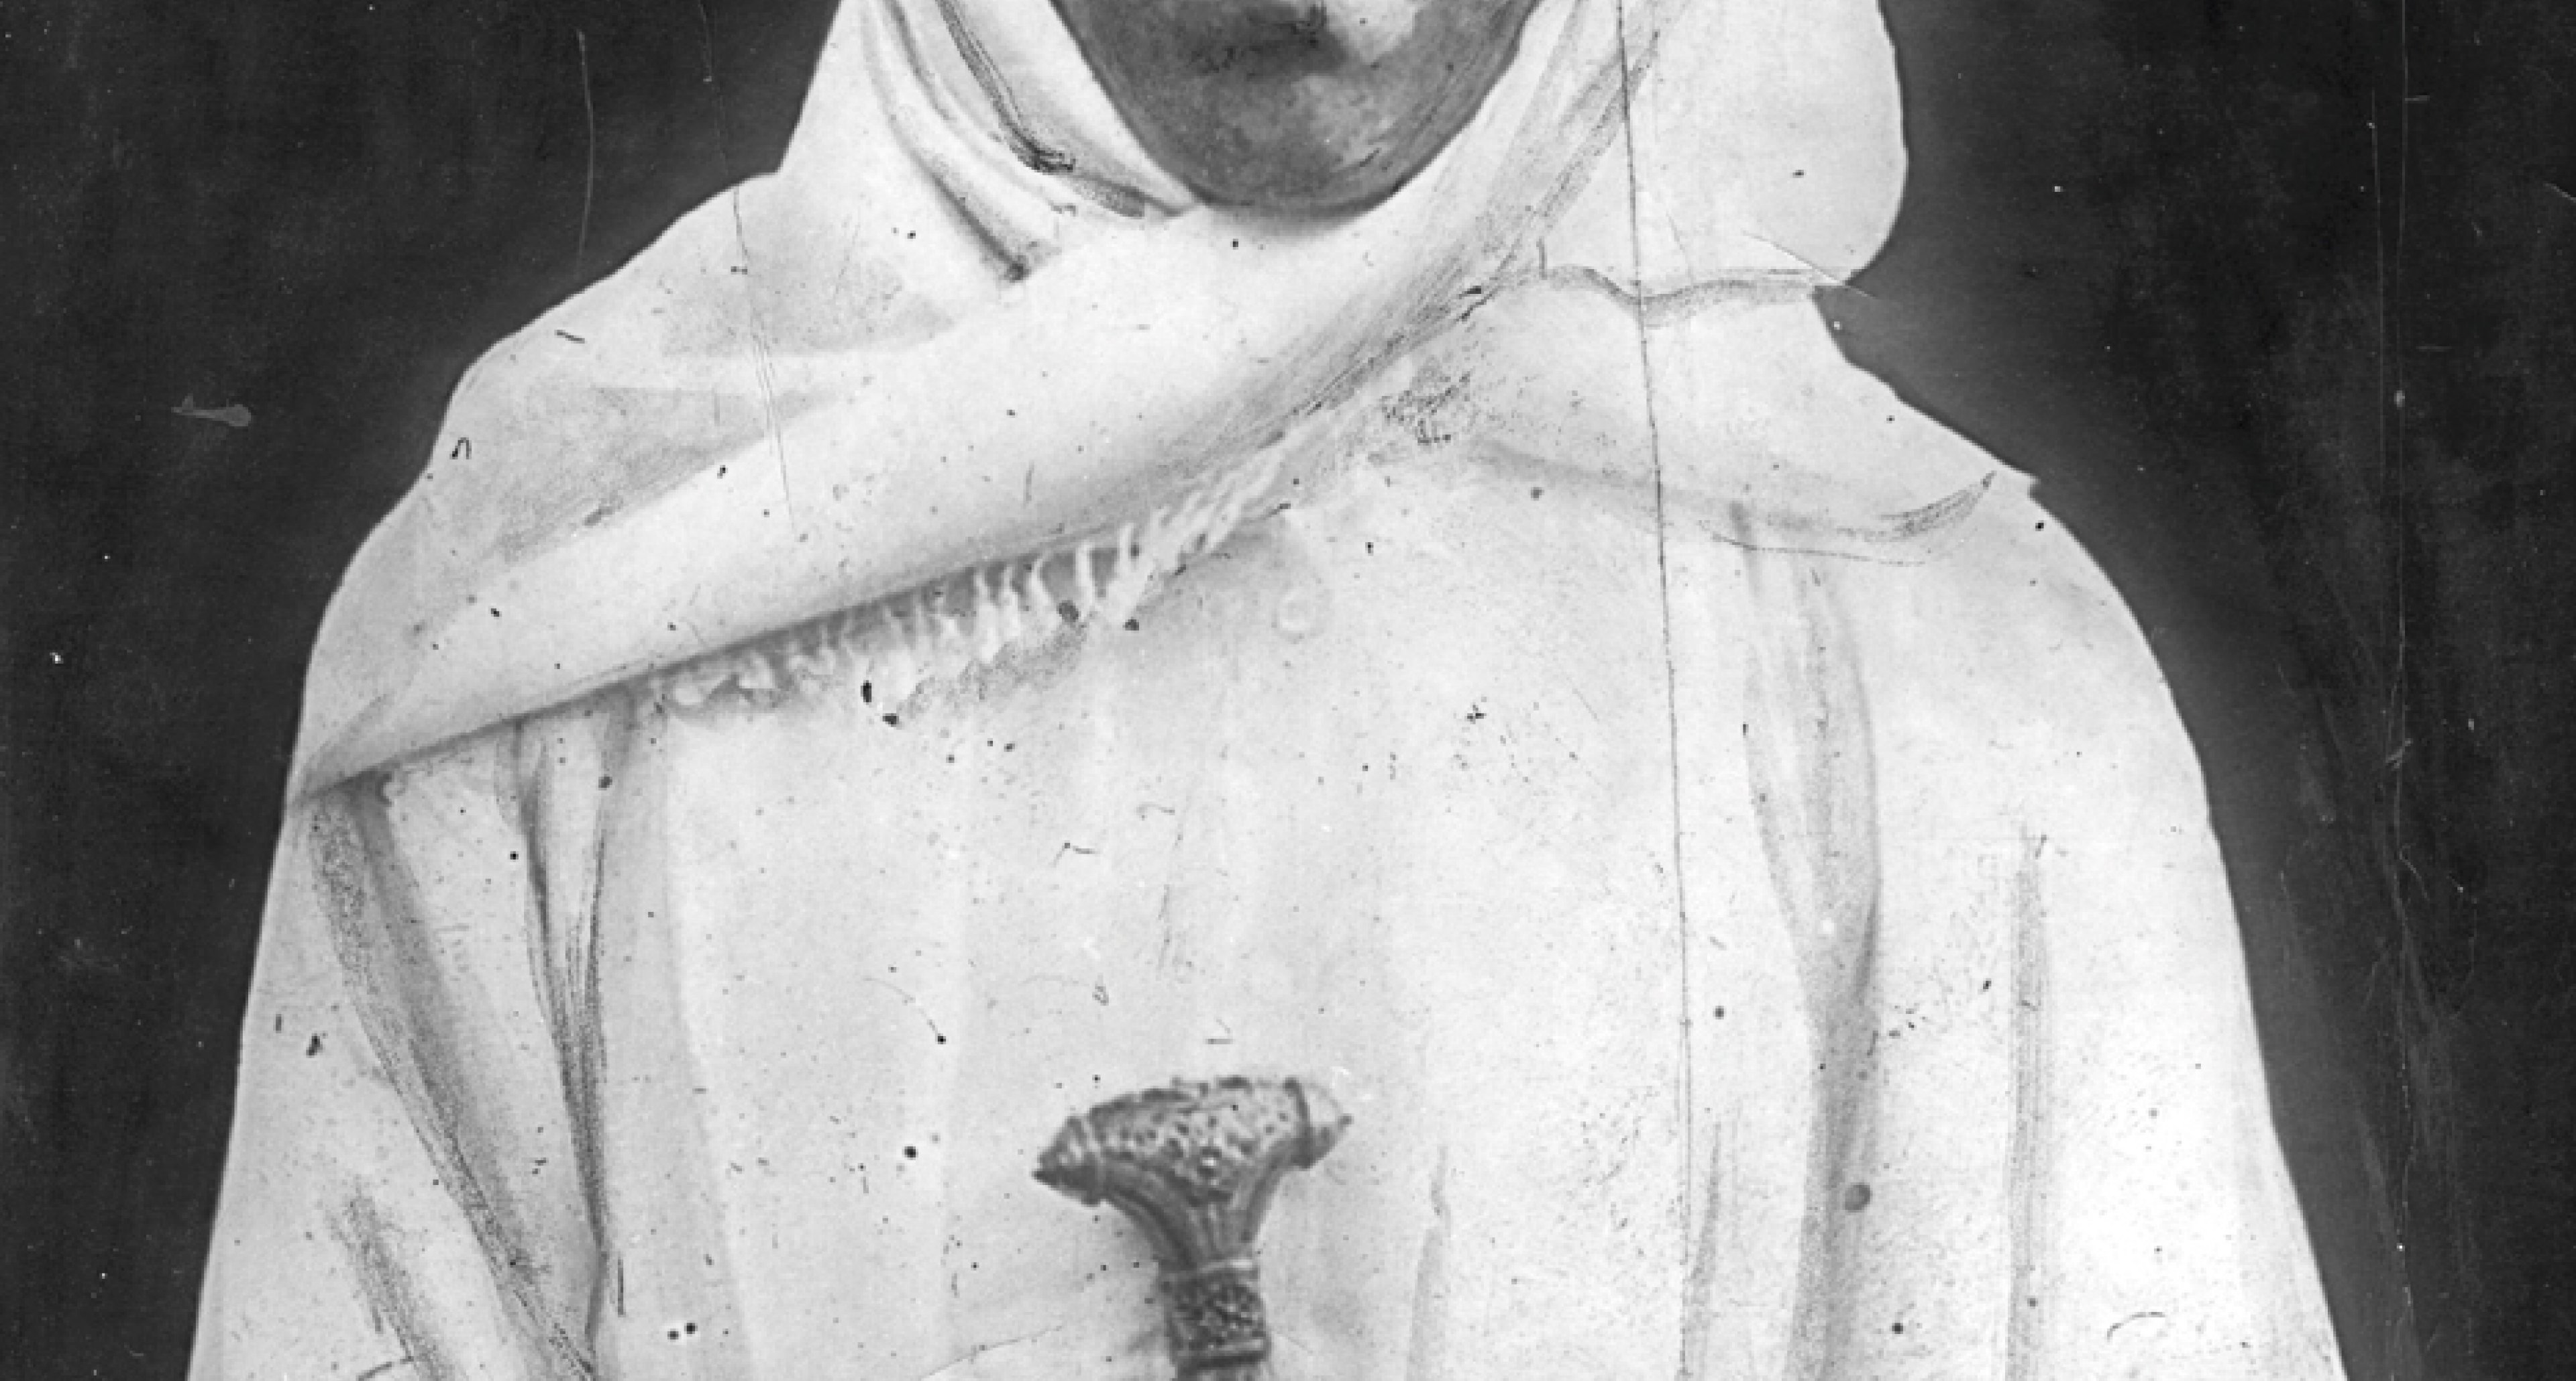 T.E. Lawrence - PhotobyHultonArchive/GettyImages. Original Man, Copyright Gestalten 2014